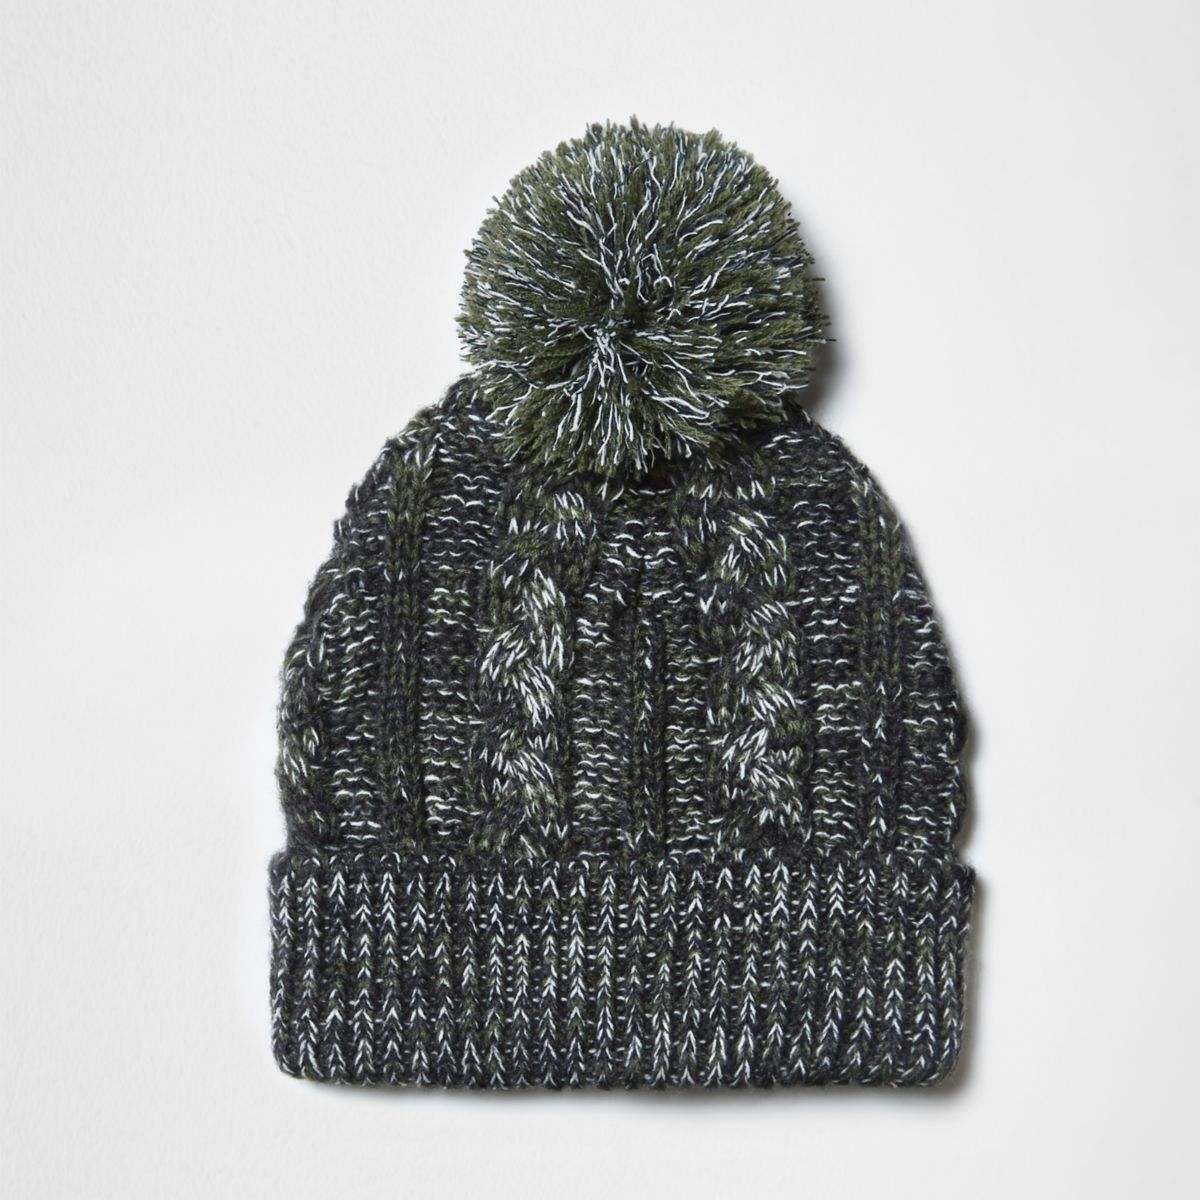 Green cable knit pom pom beanie hat